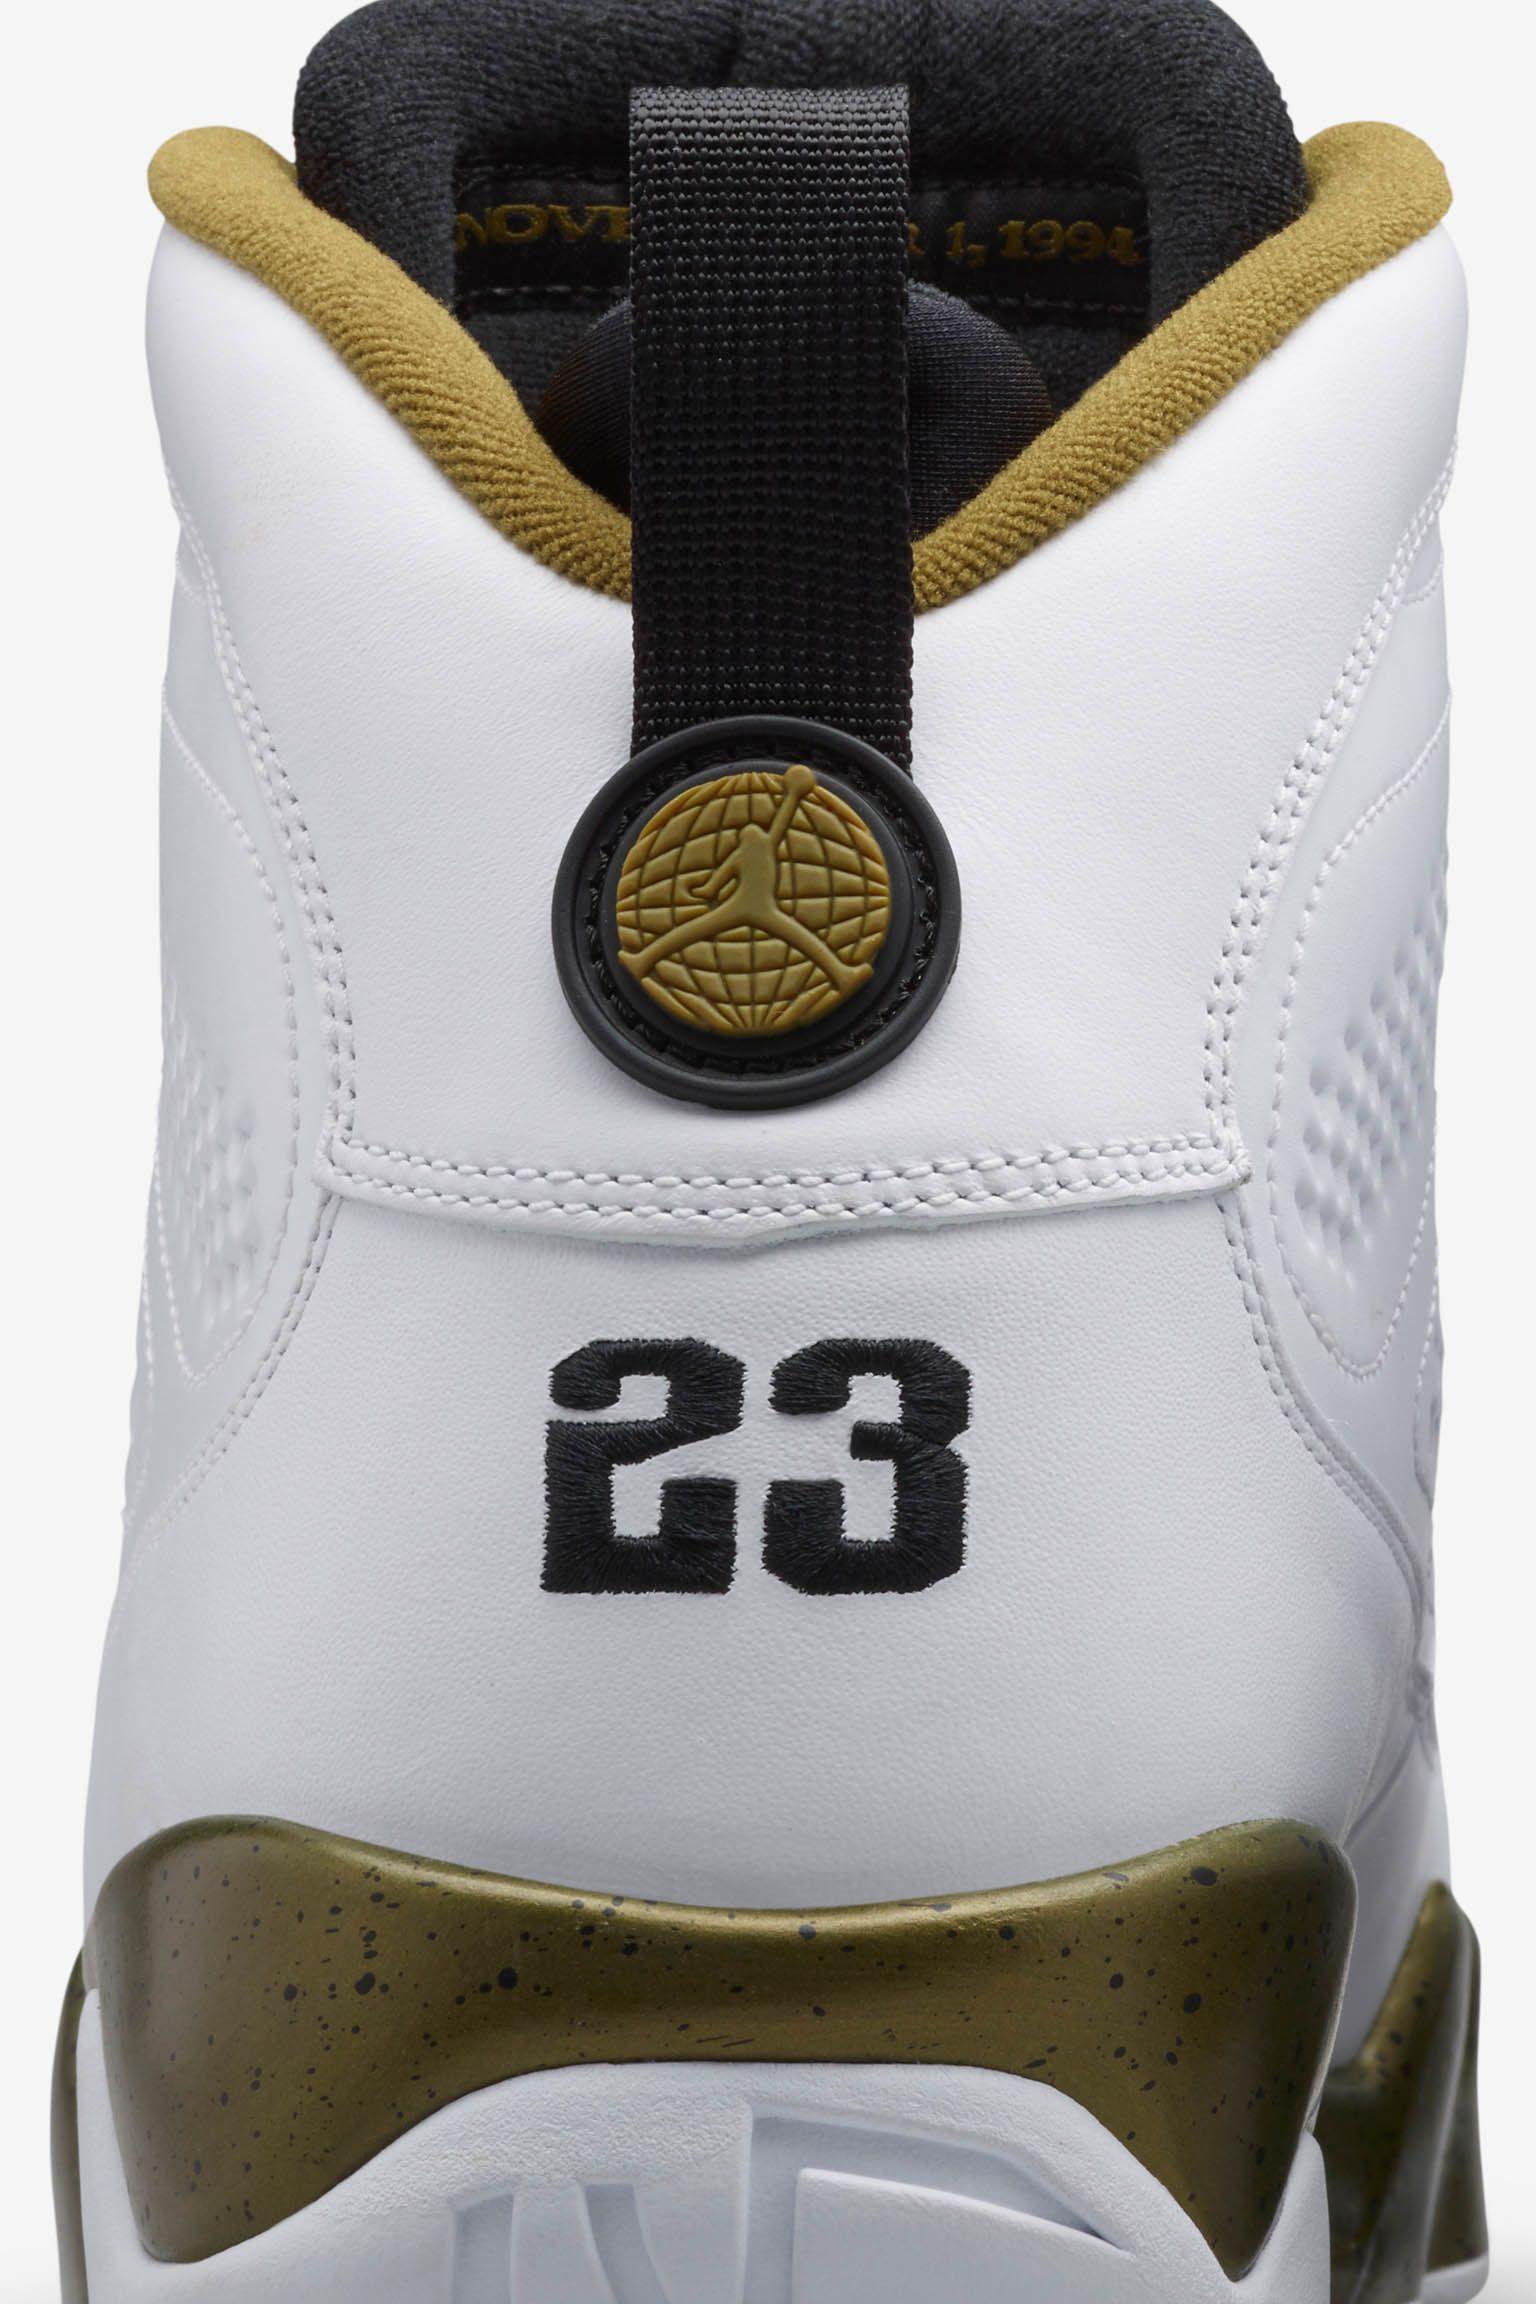 Air Jordan 9 Retro 'Statue' Release Date